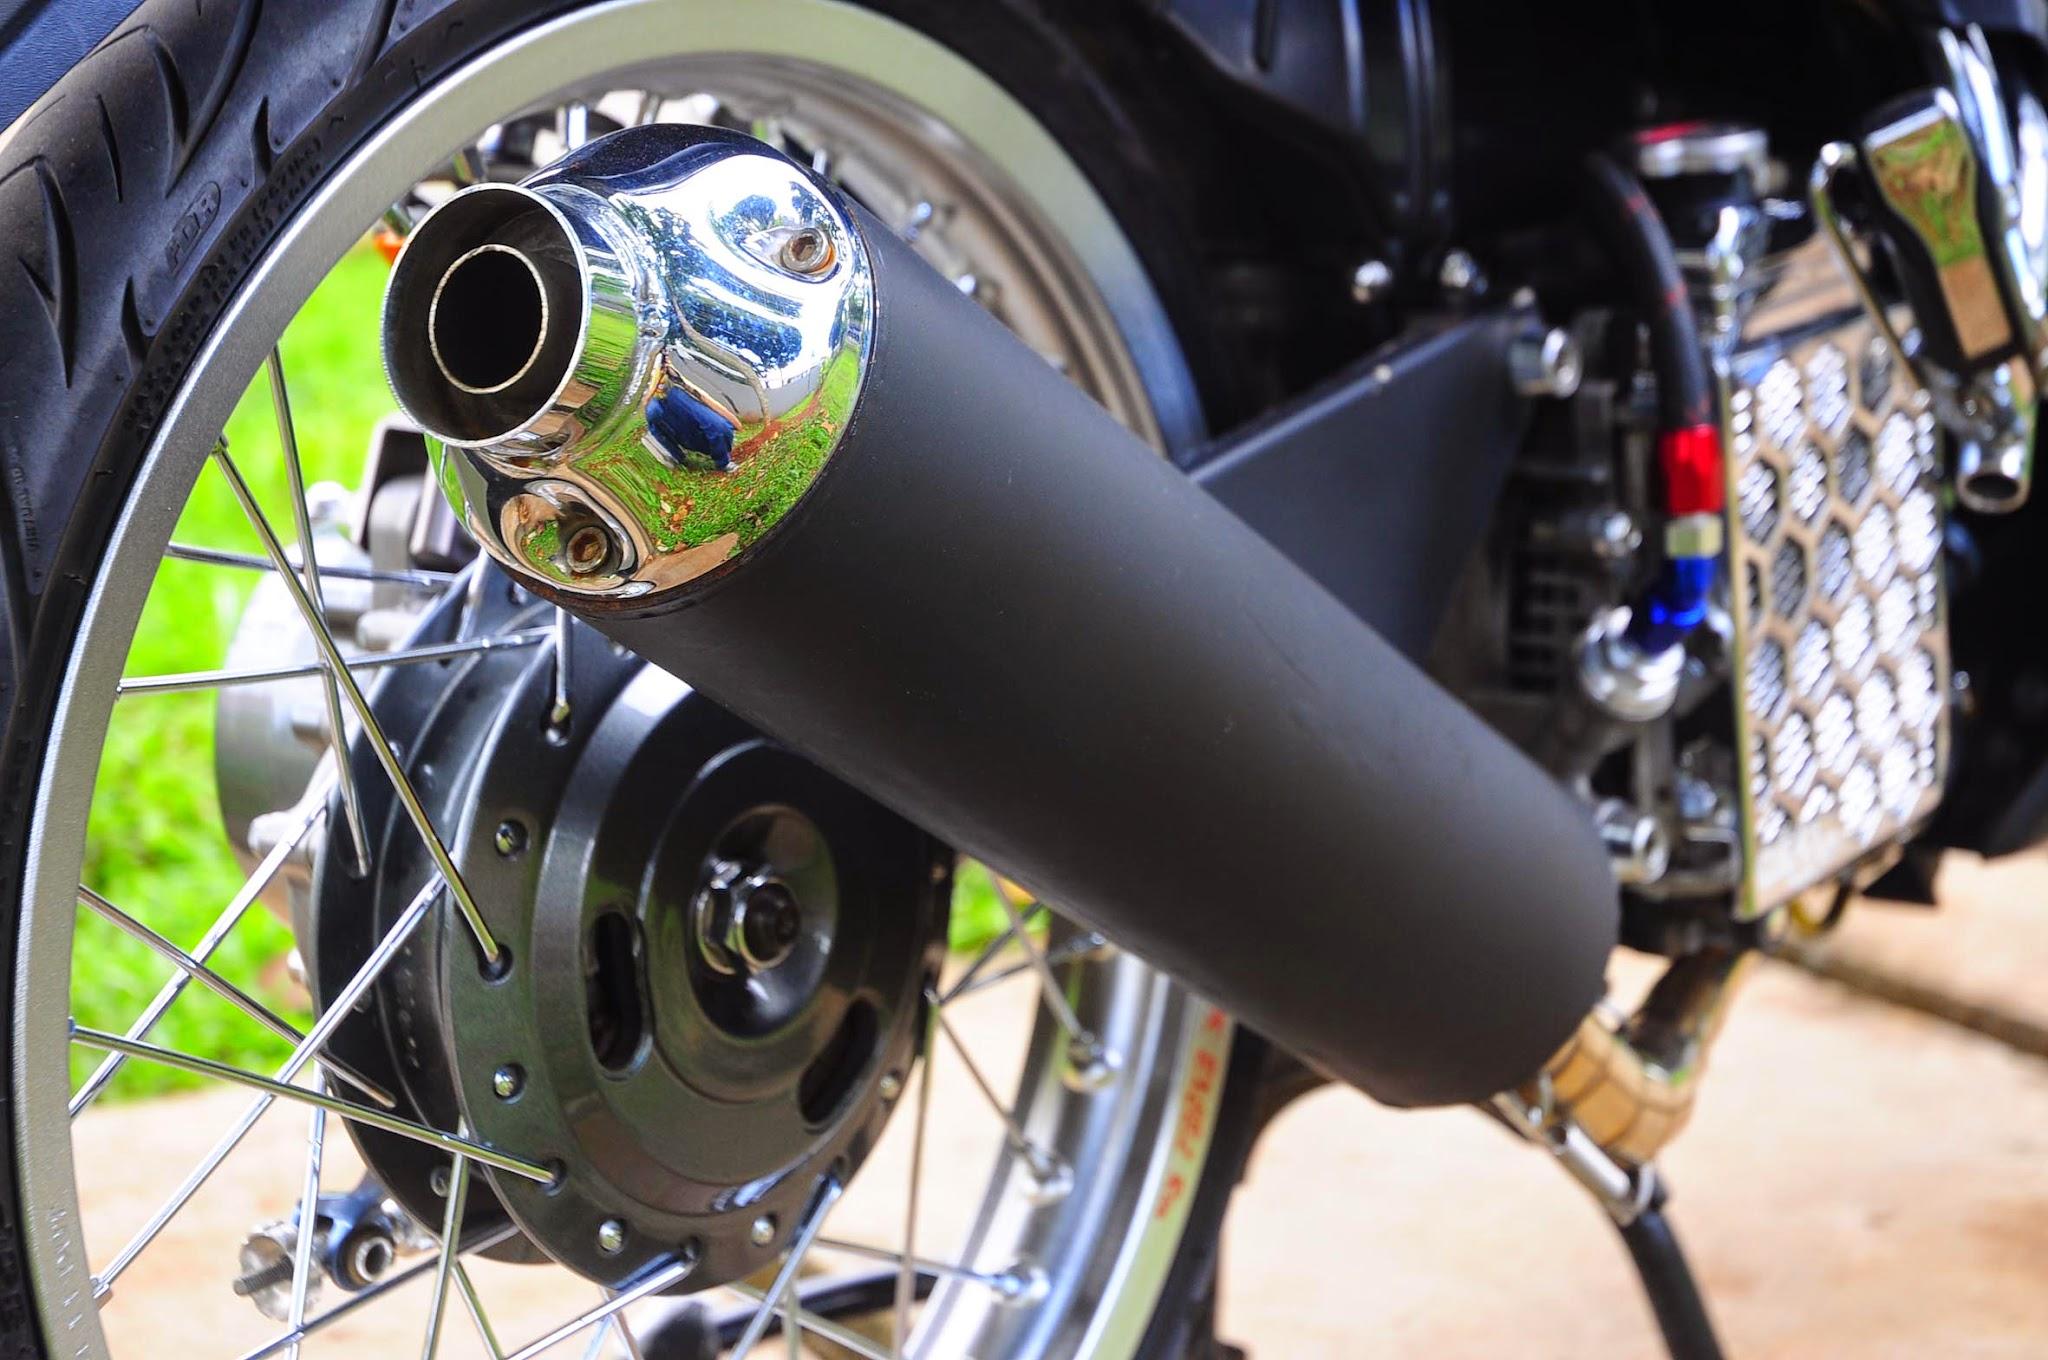 modifikasi motor vario techno 125 pgm fi